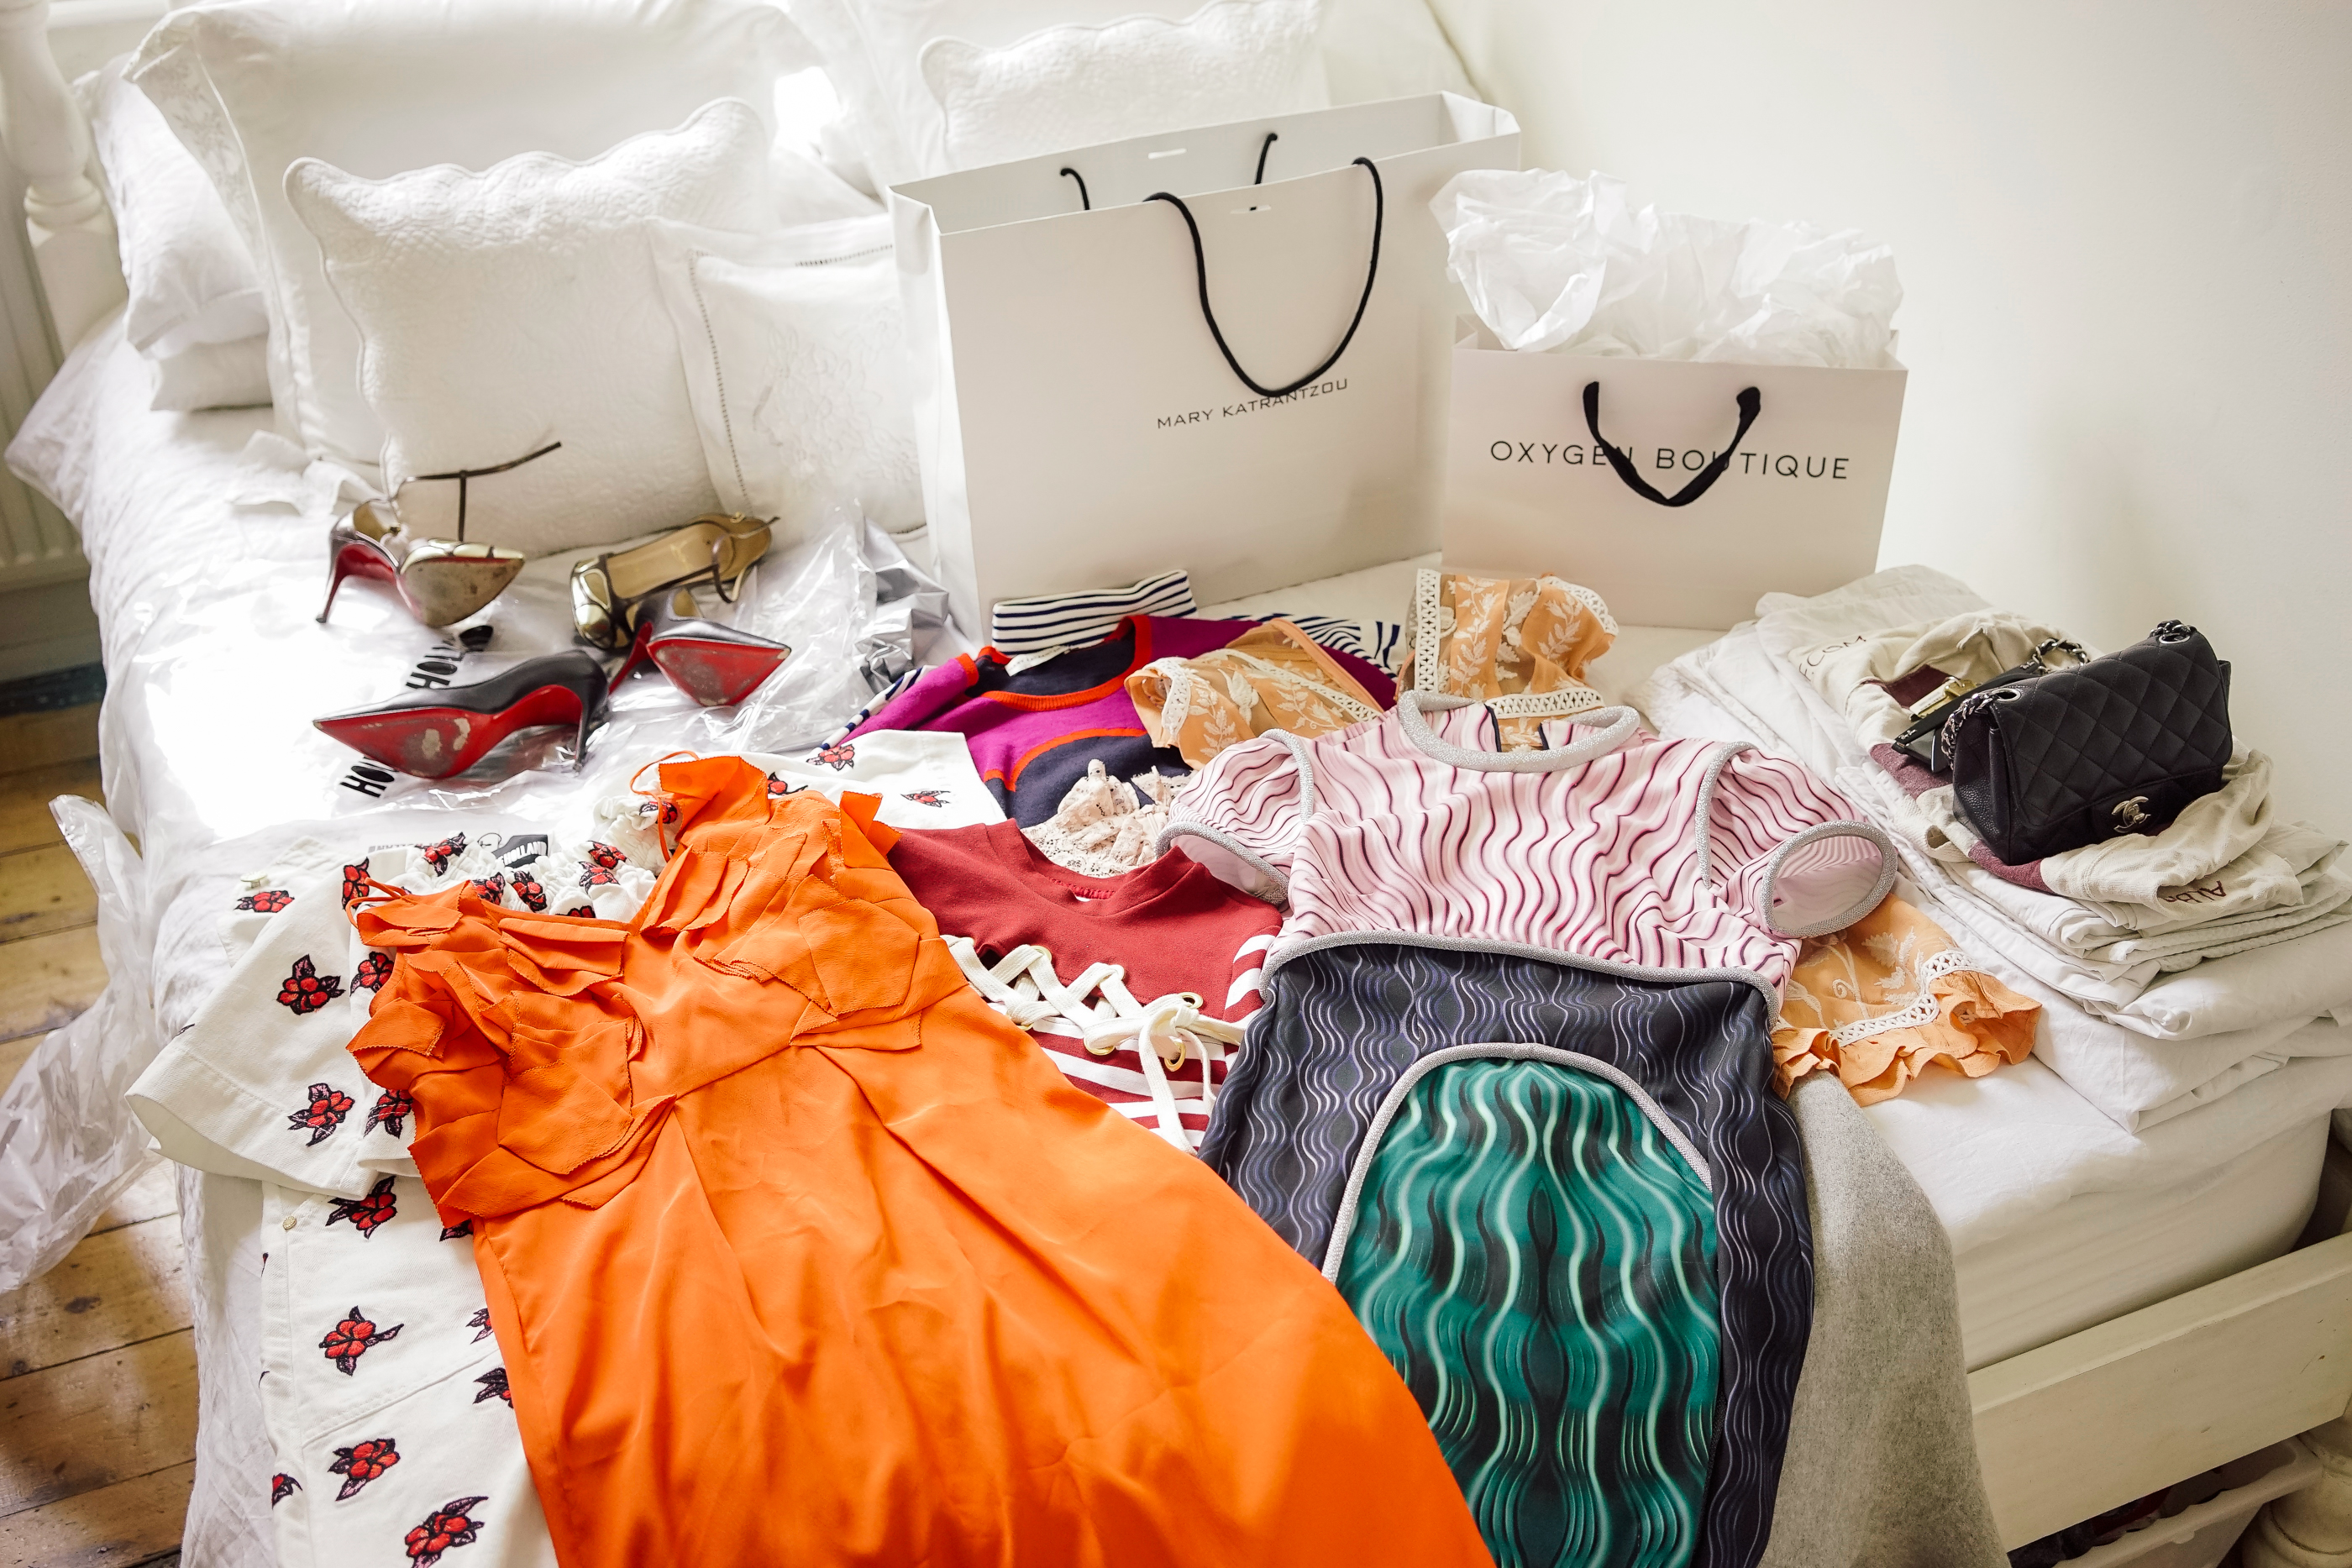 Online shopping can wreak havoc on your cashflow